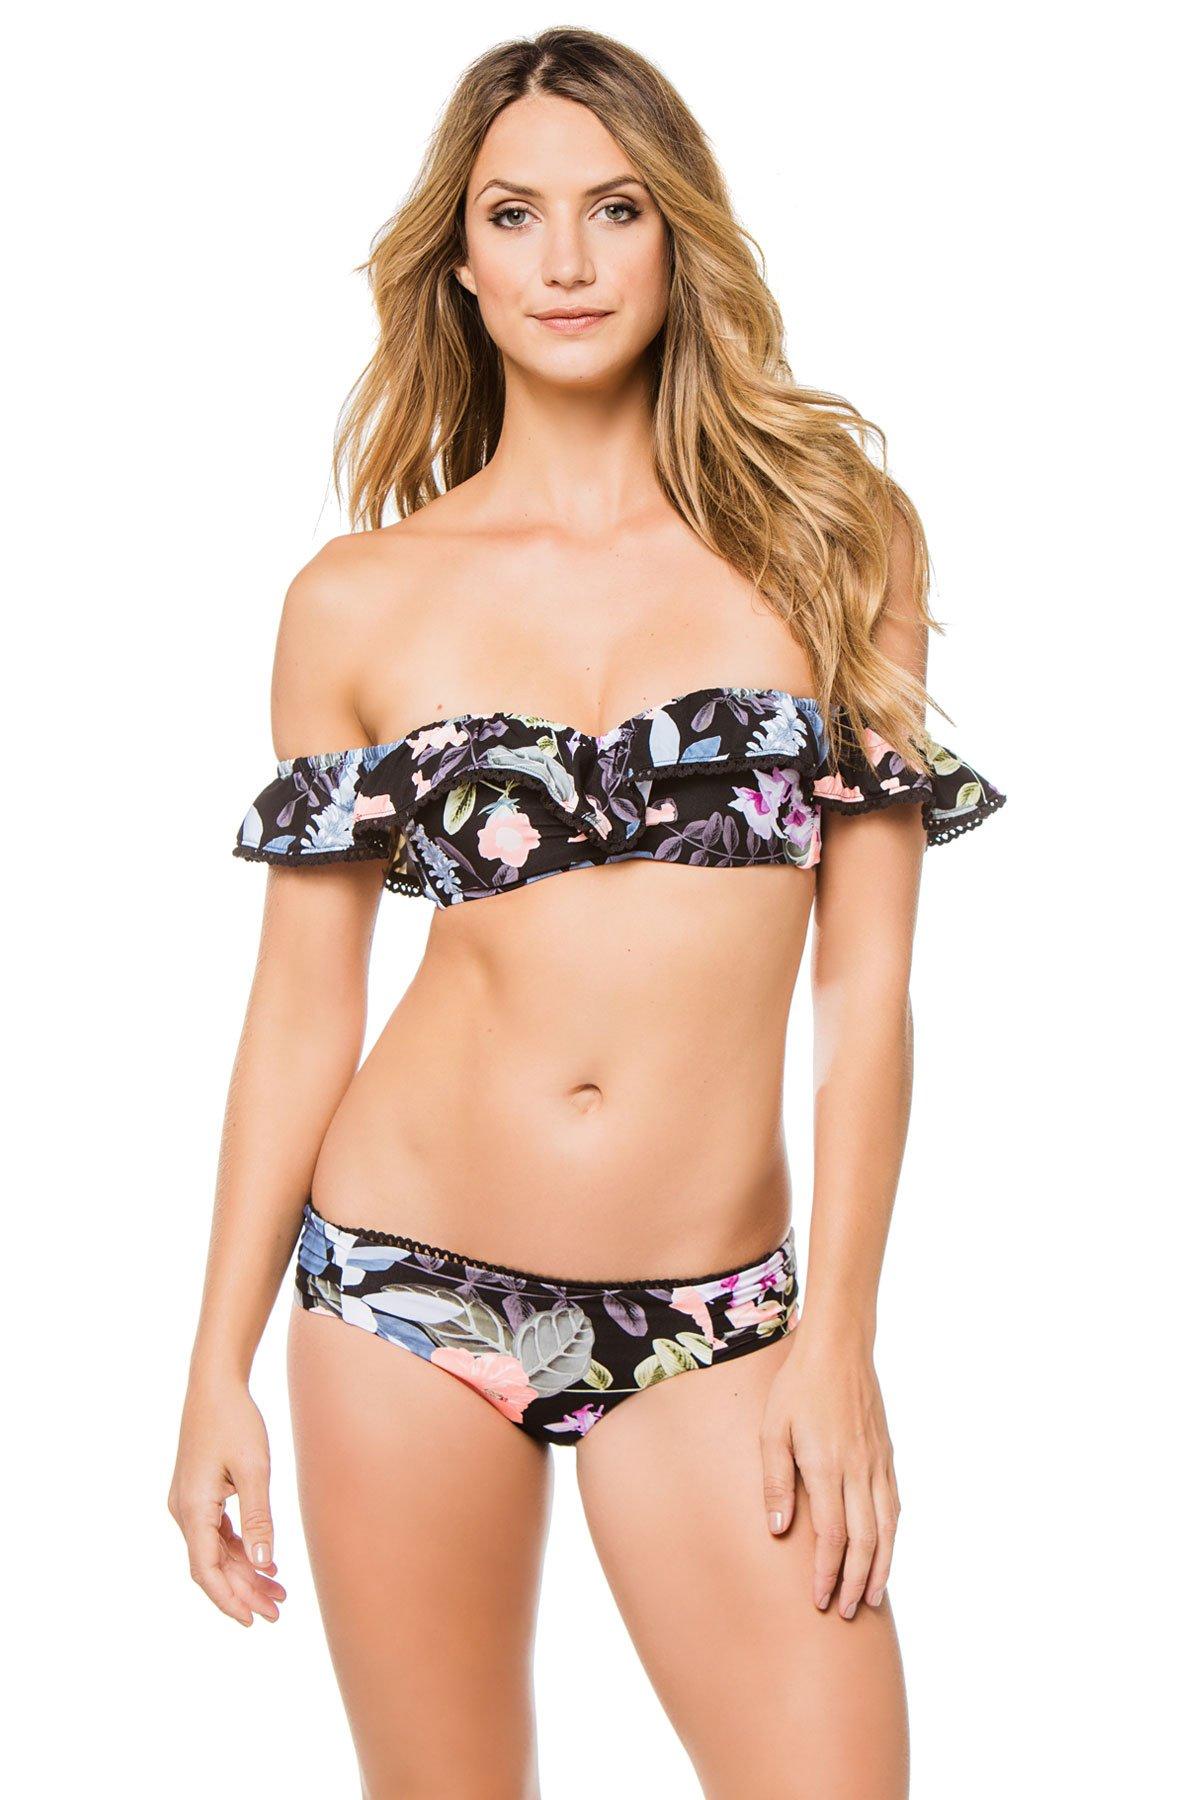 Seafolly Women's Summer Vacay Bandeau Bikini Top Black 8